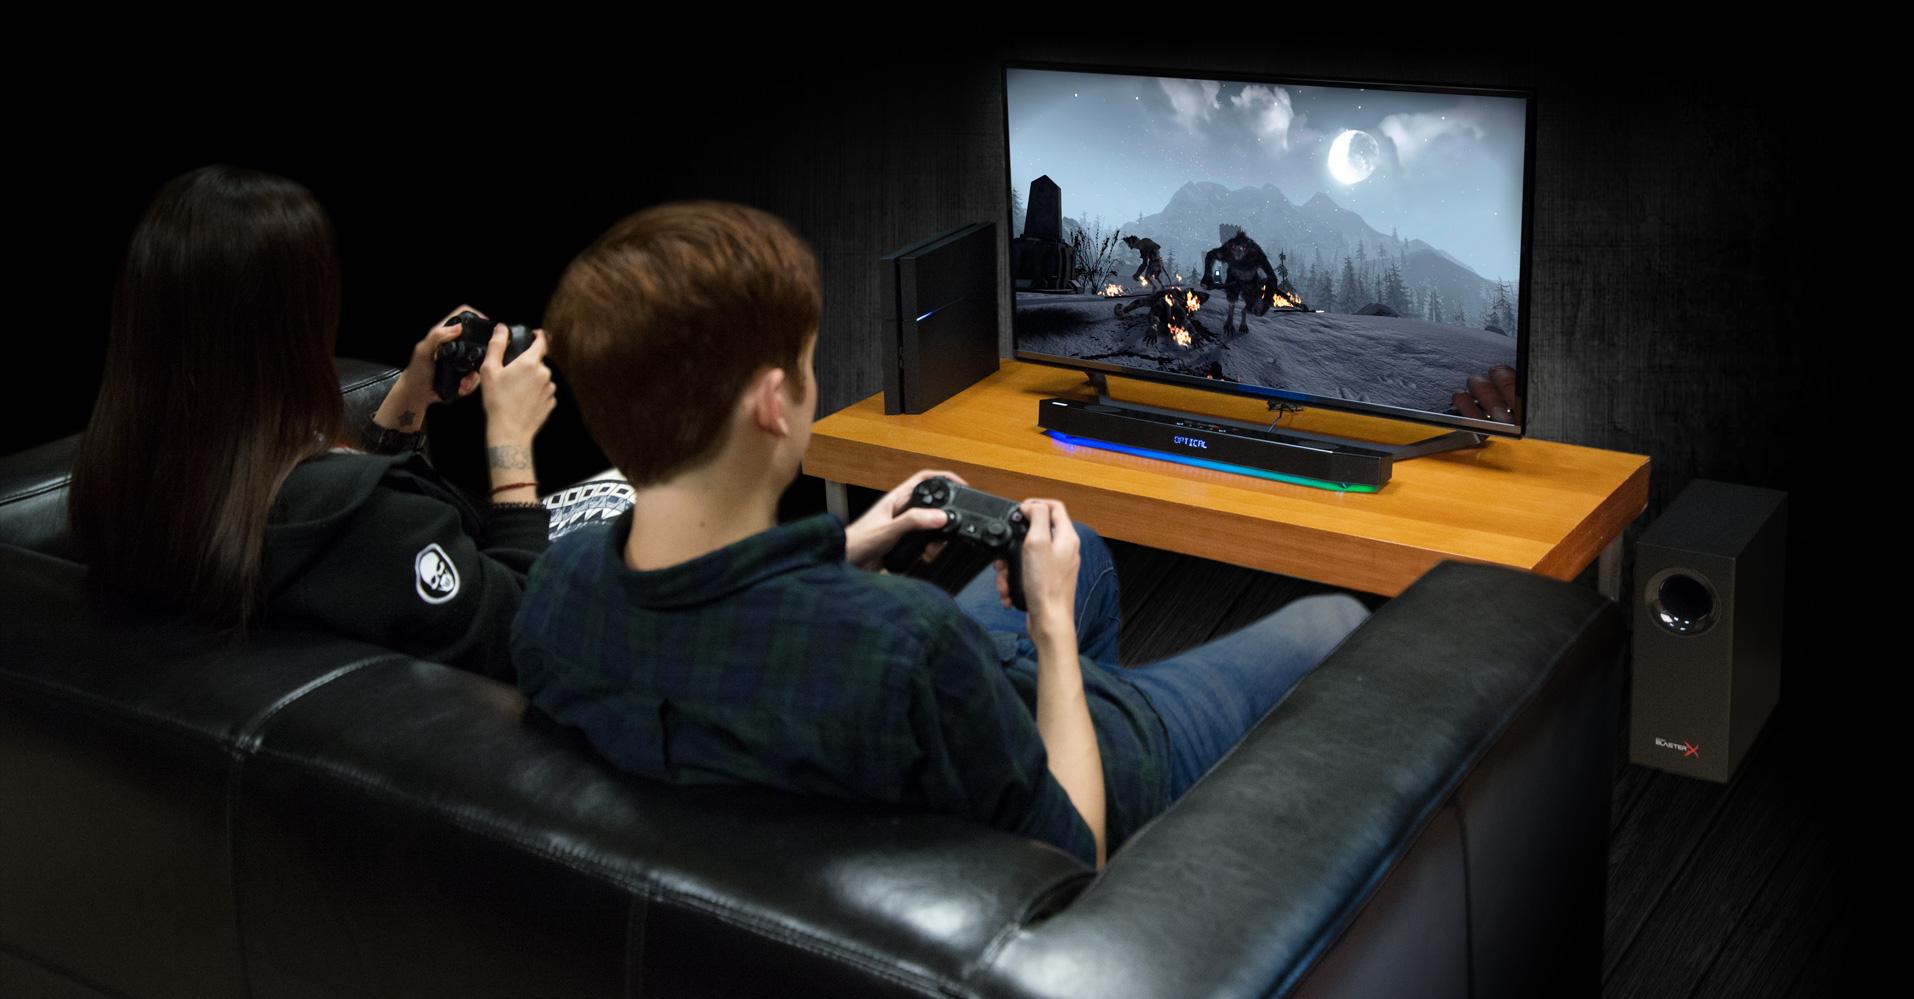 Sound BlasterX Katana - Multi-channel Gaming Soundbar - Creative Labs (Pan Euro)